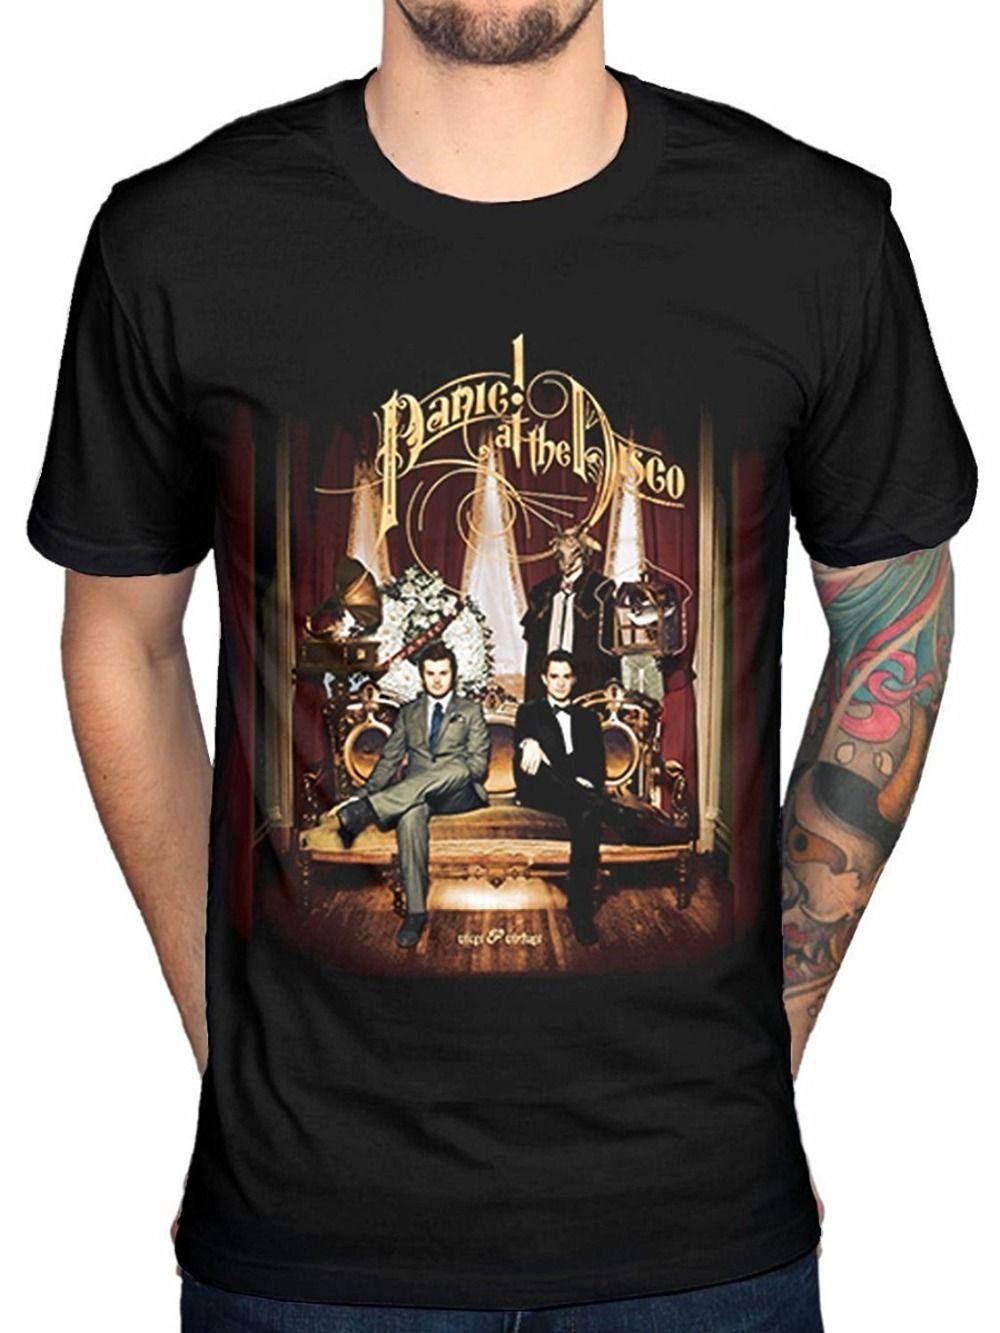 d657bde7b Printed Shirts Men's Short Panic At The Disco Men's Black Cotton T-Shirt  Top Tee Crew Neck Best Friend Shirts